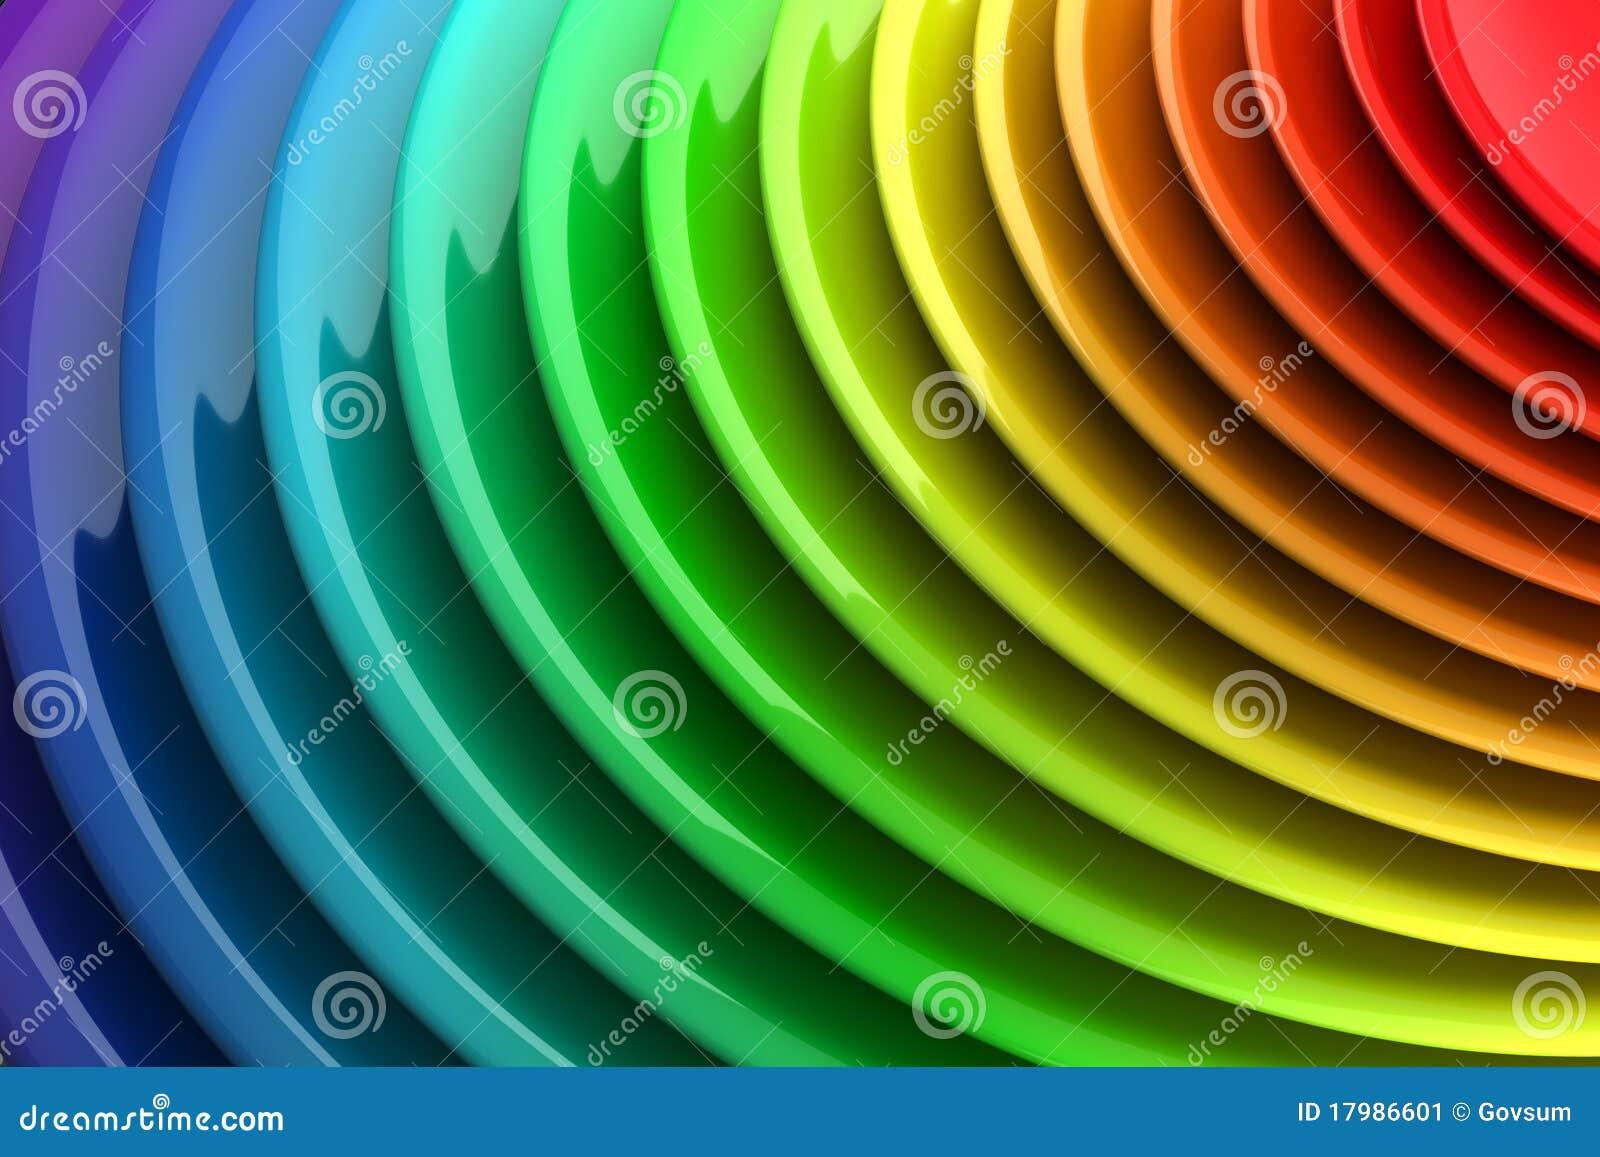 Vibrant Color Wallpaper | www.imgkid.com - The Image Kid ...